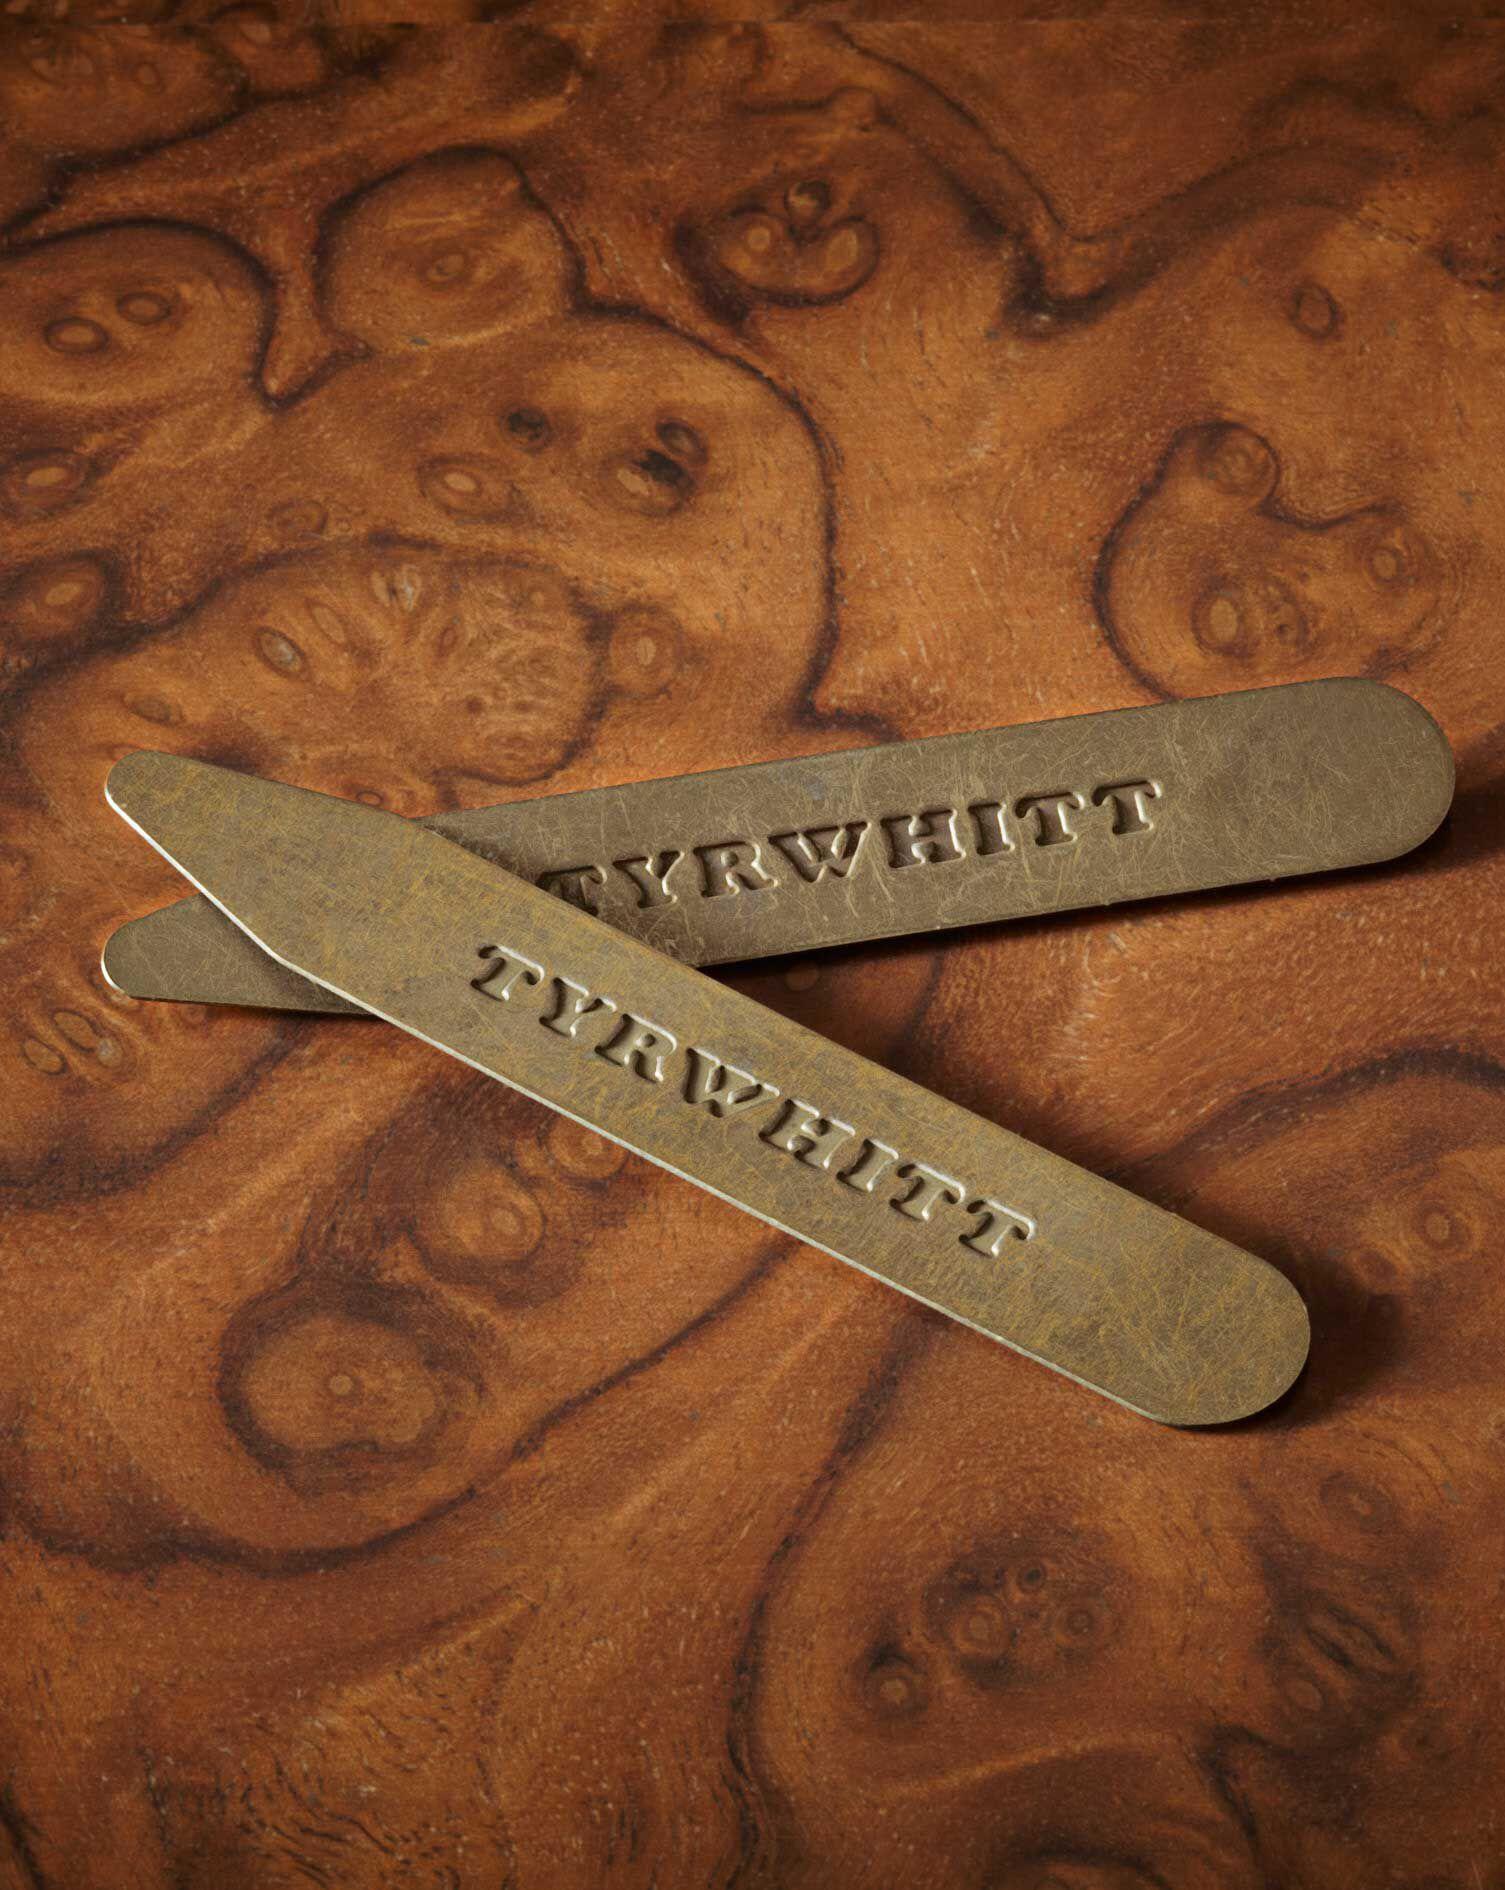 Solid Brass Cut Away Collar Stiffeners by Charles Tyrwhitt